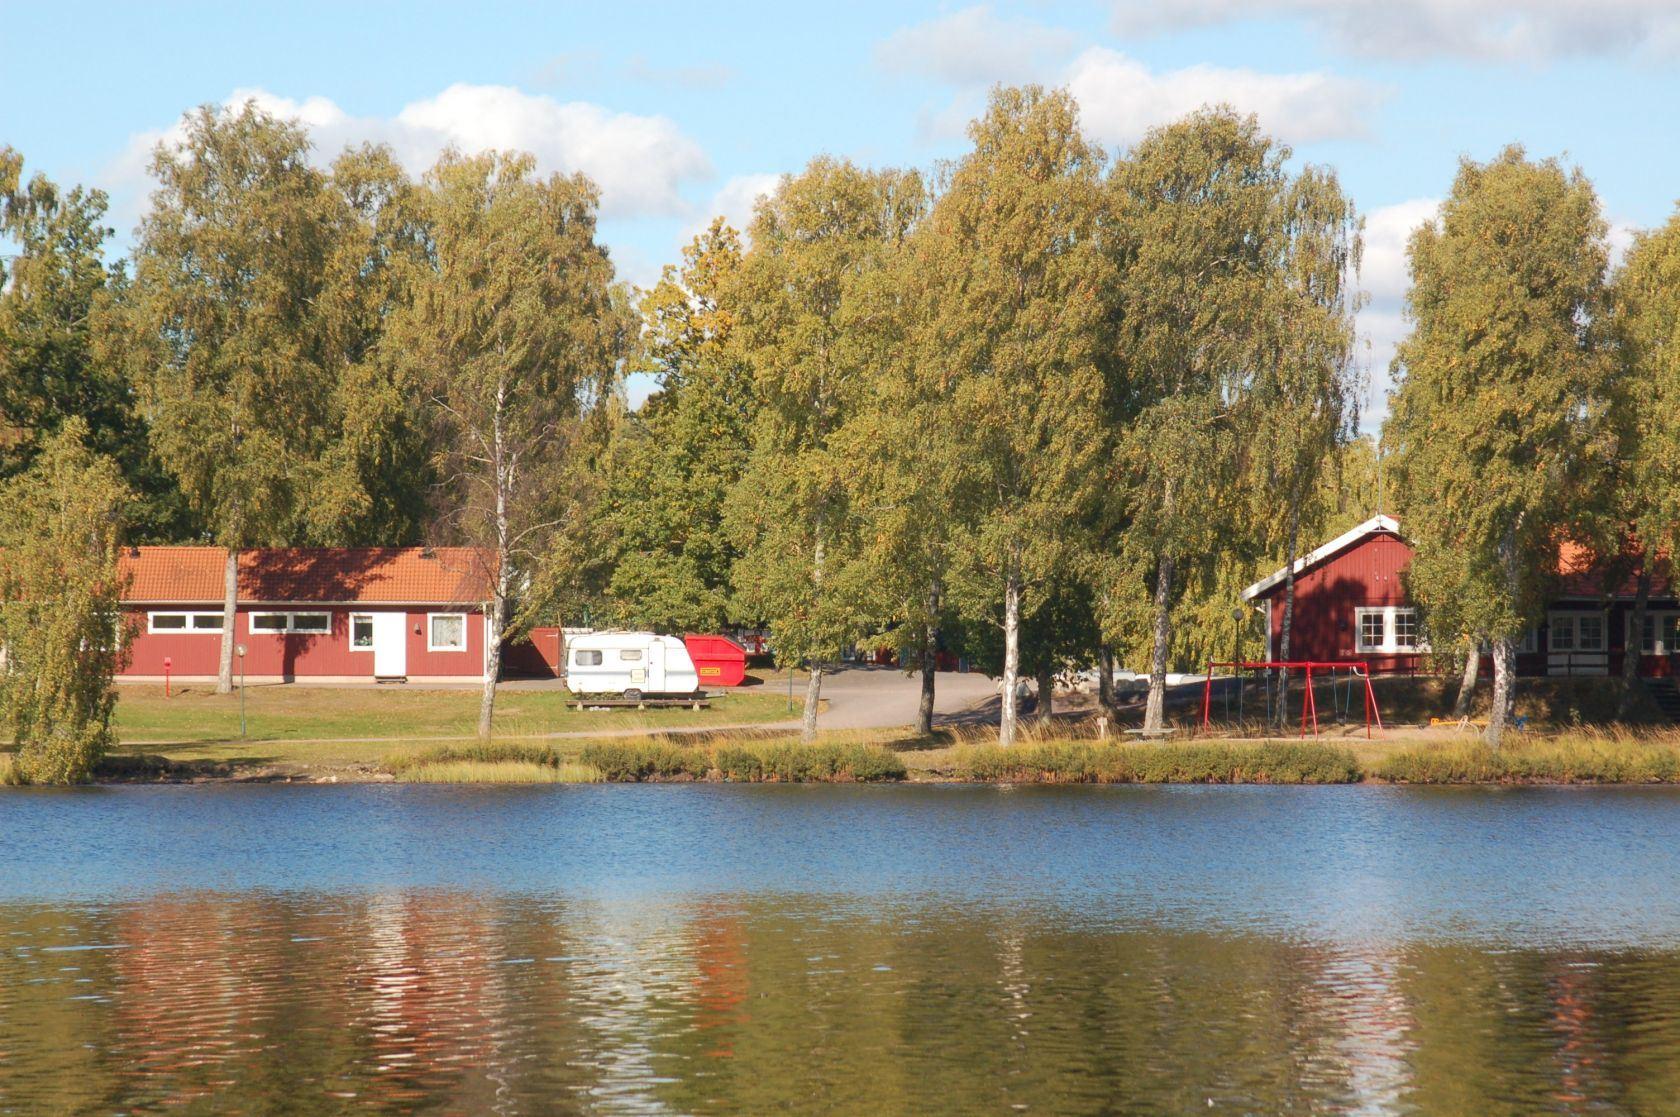 Sjötorpets Camping, Restaurang and Café/Cottages